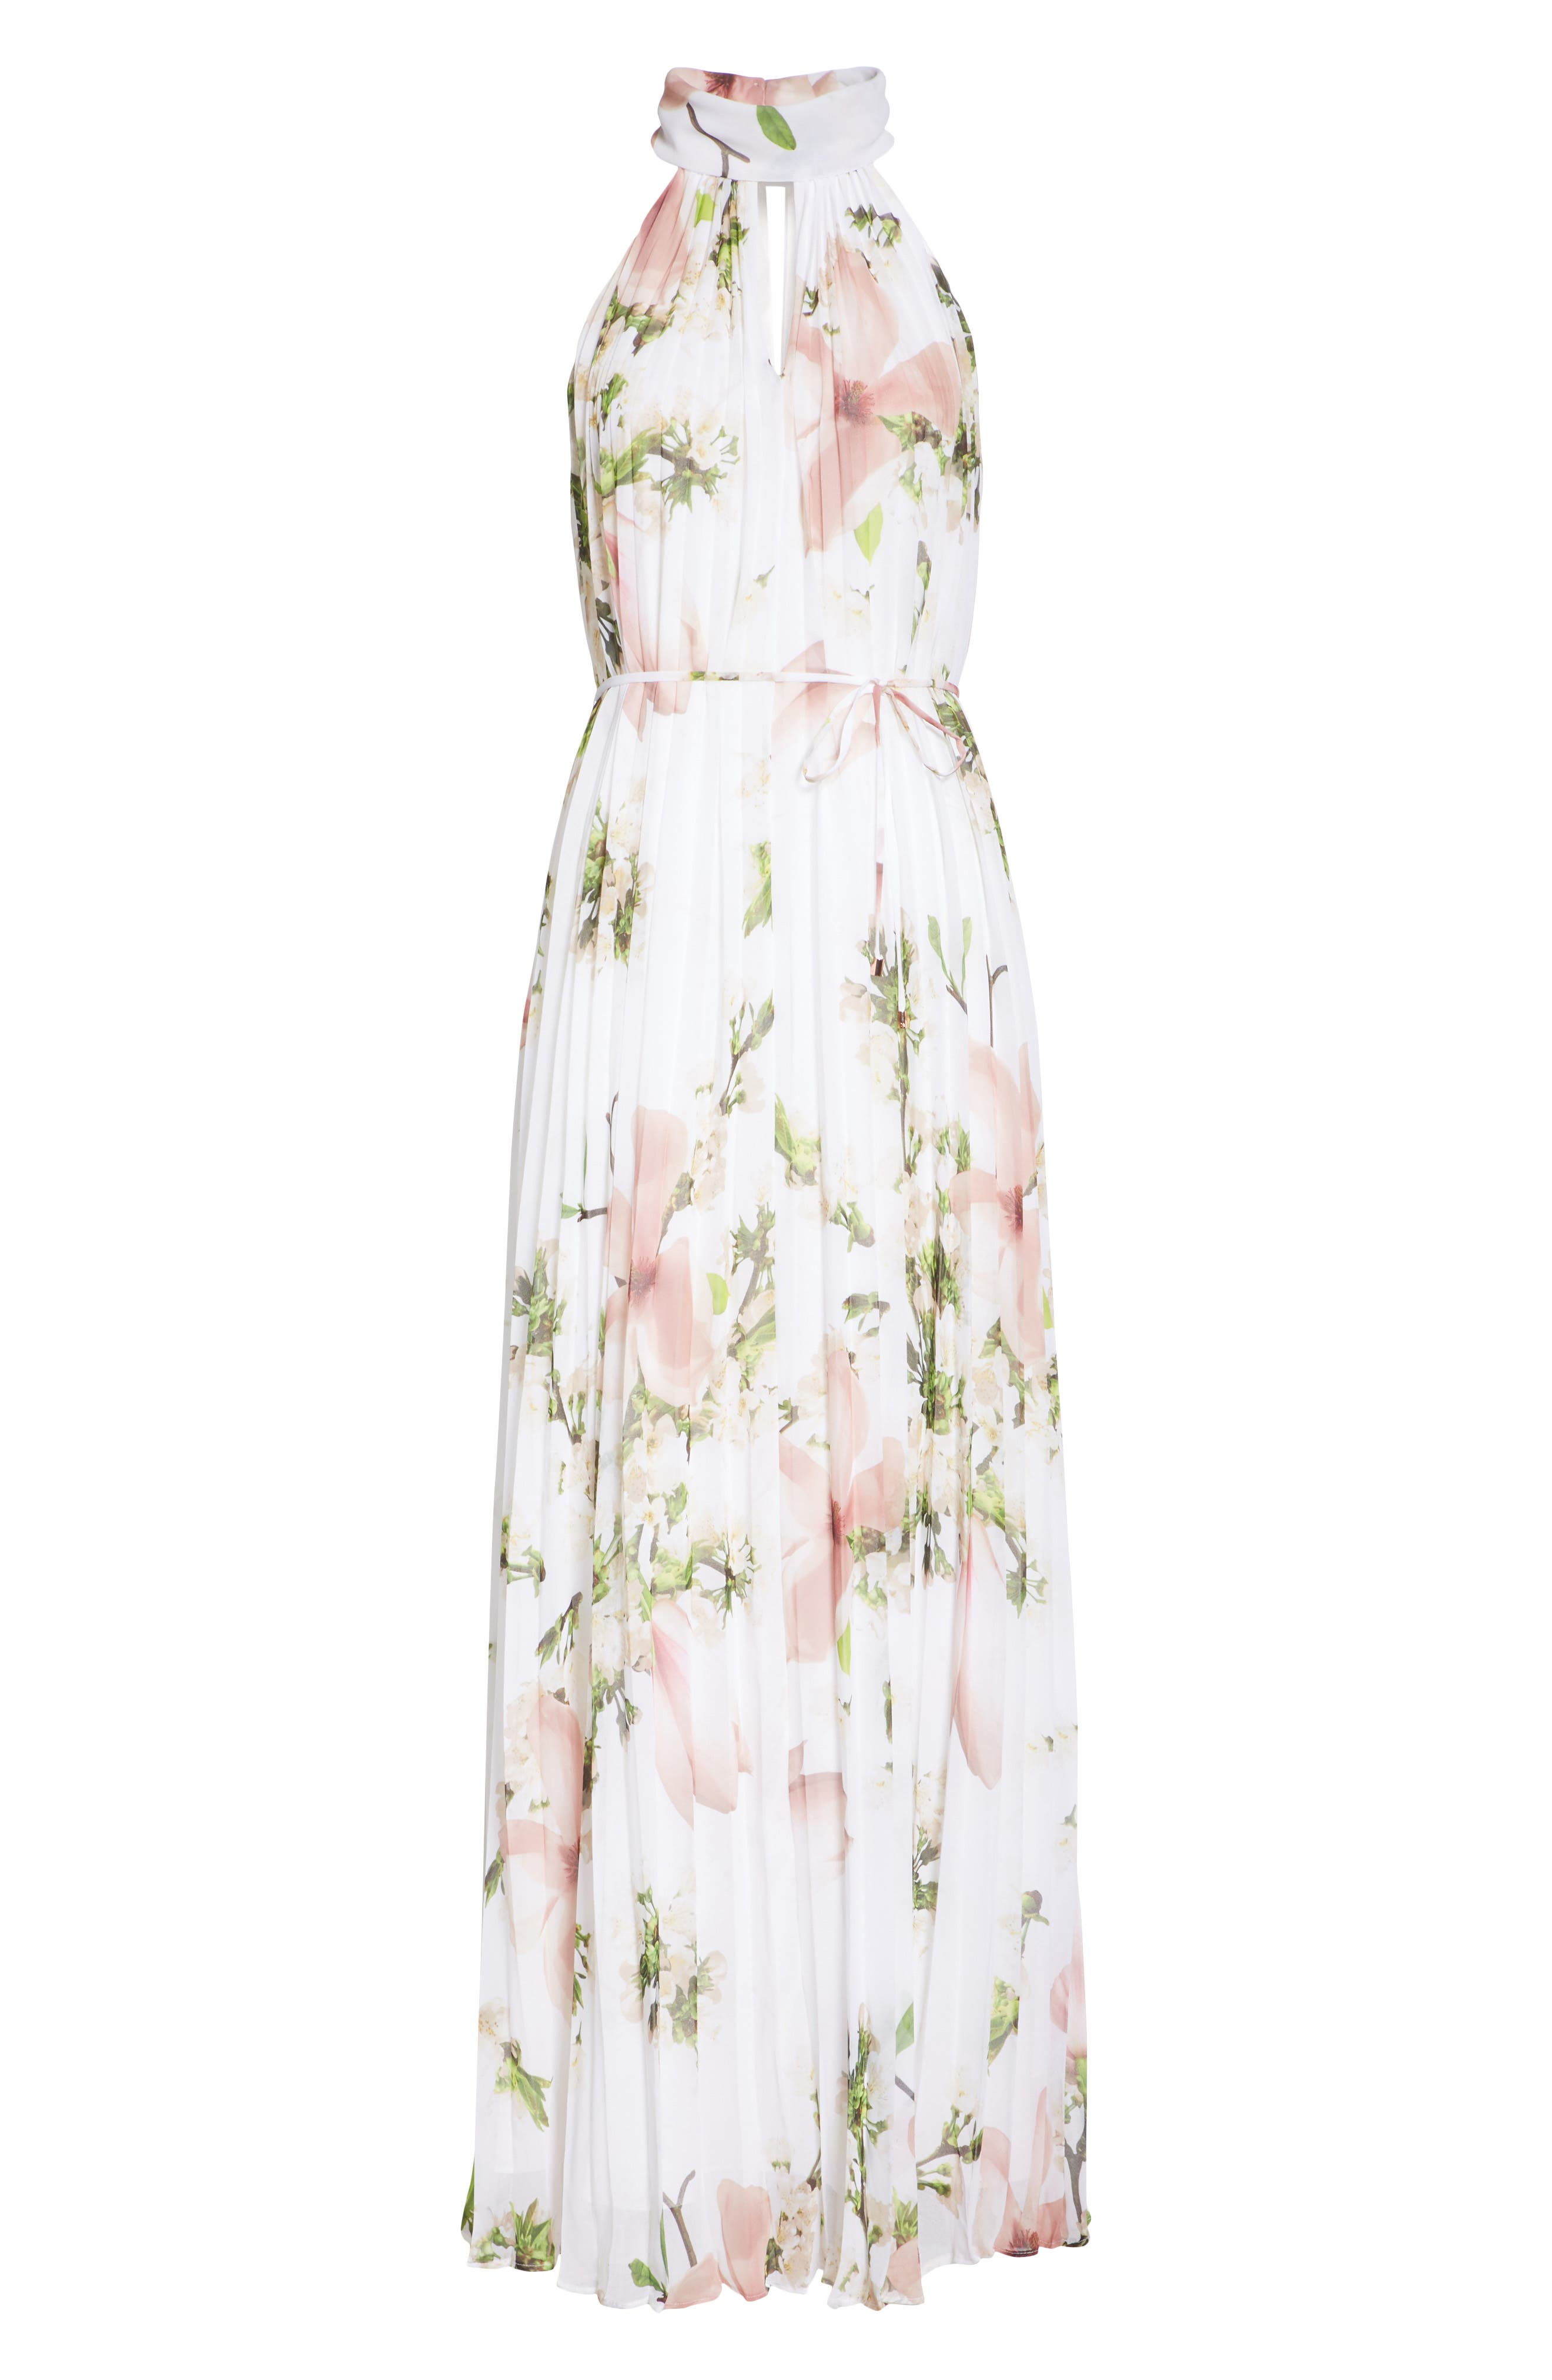 Harmony Pleat Maxi Dress,                             Alternate thumbnail 6, color,                             110